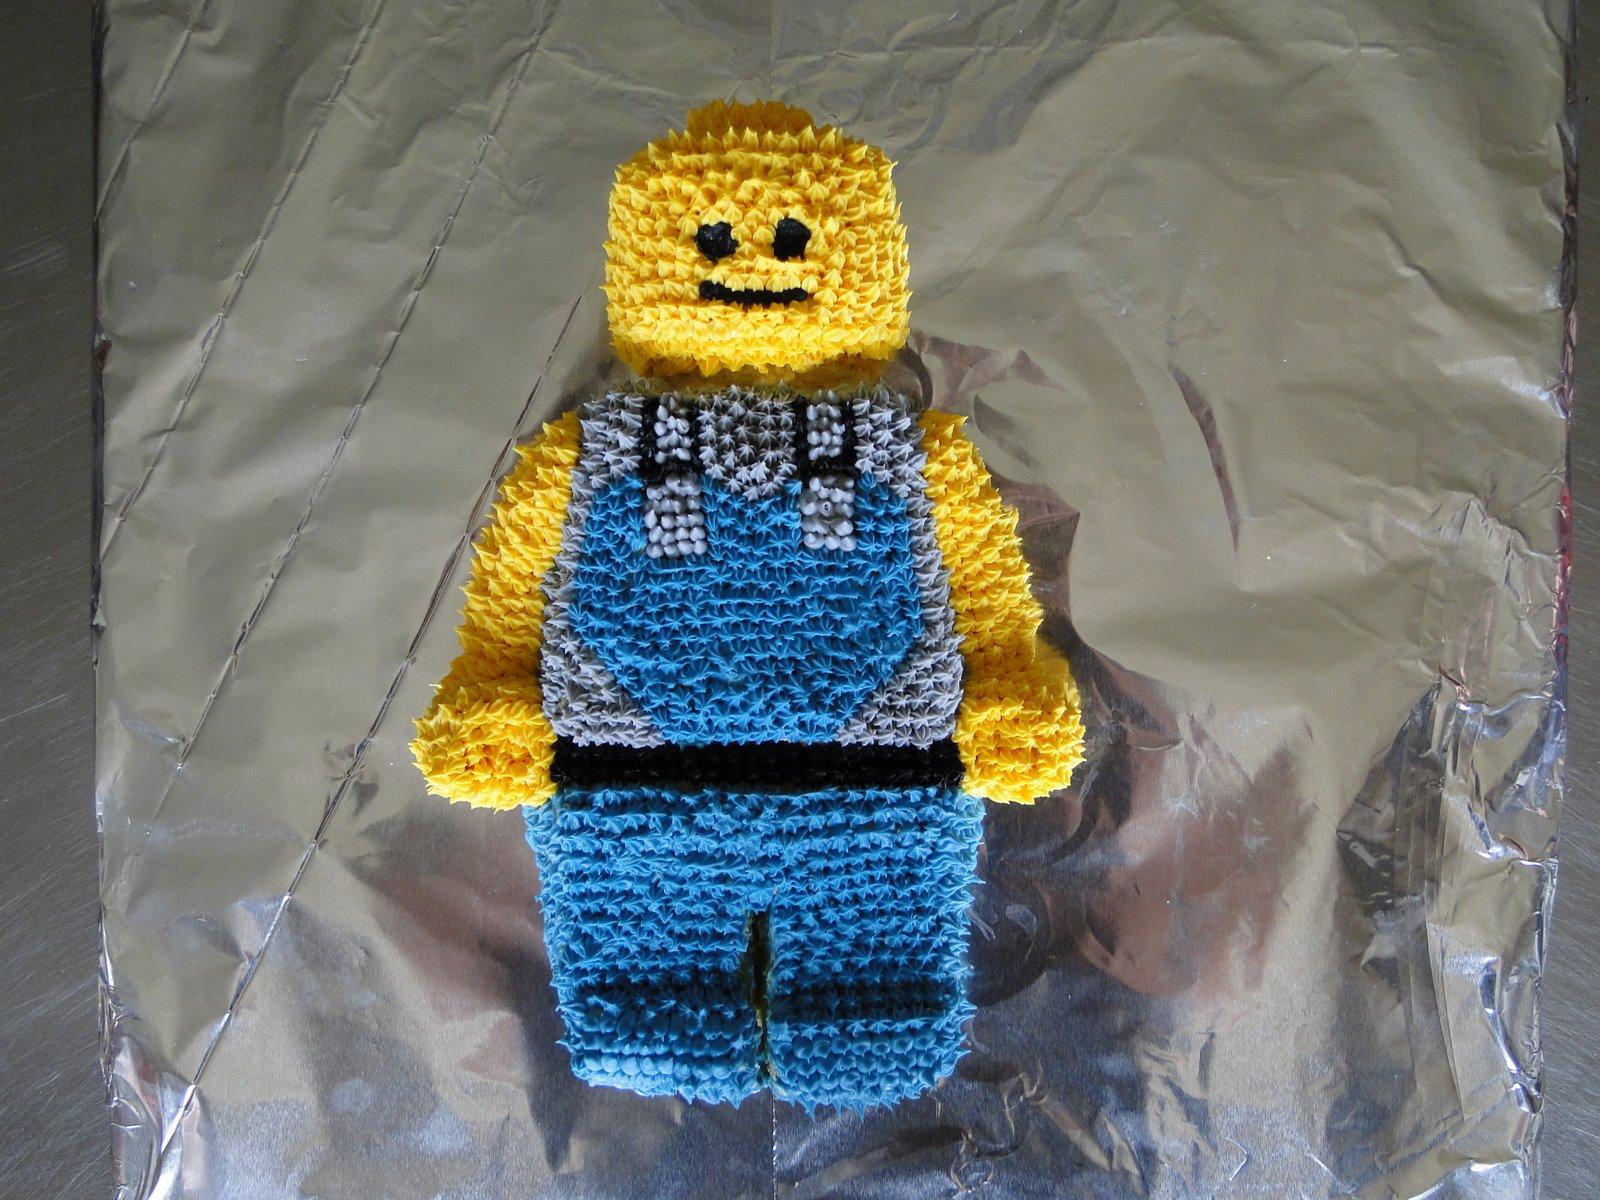 Lego Cakes Decoration Ideas Little Birthday Cakes